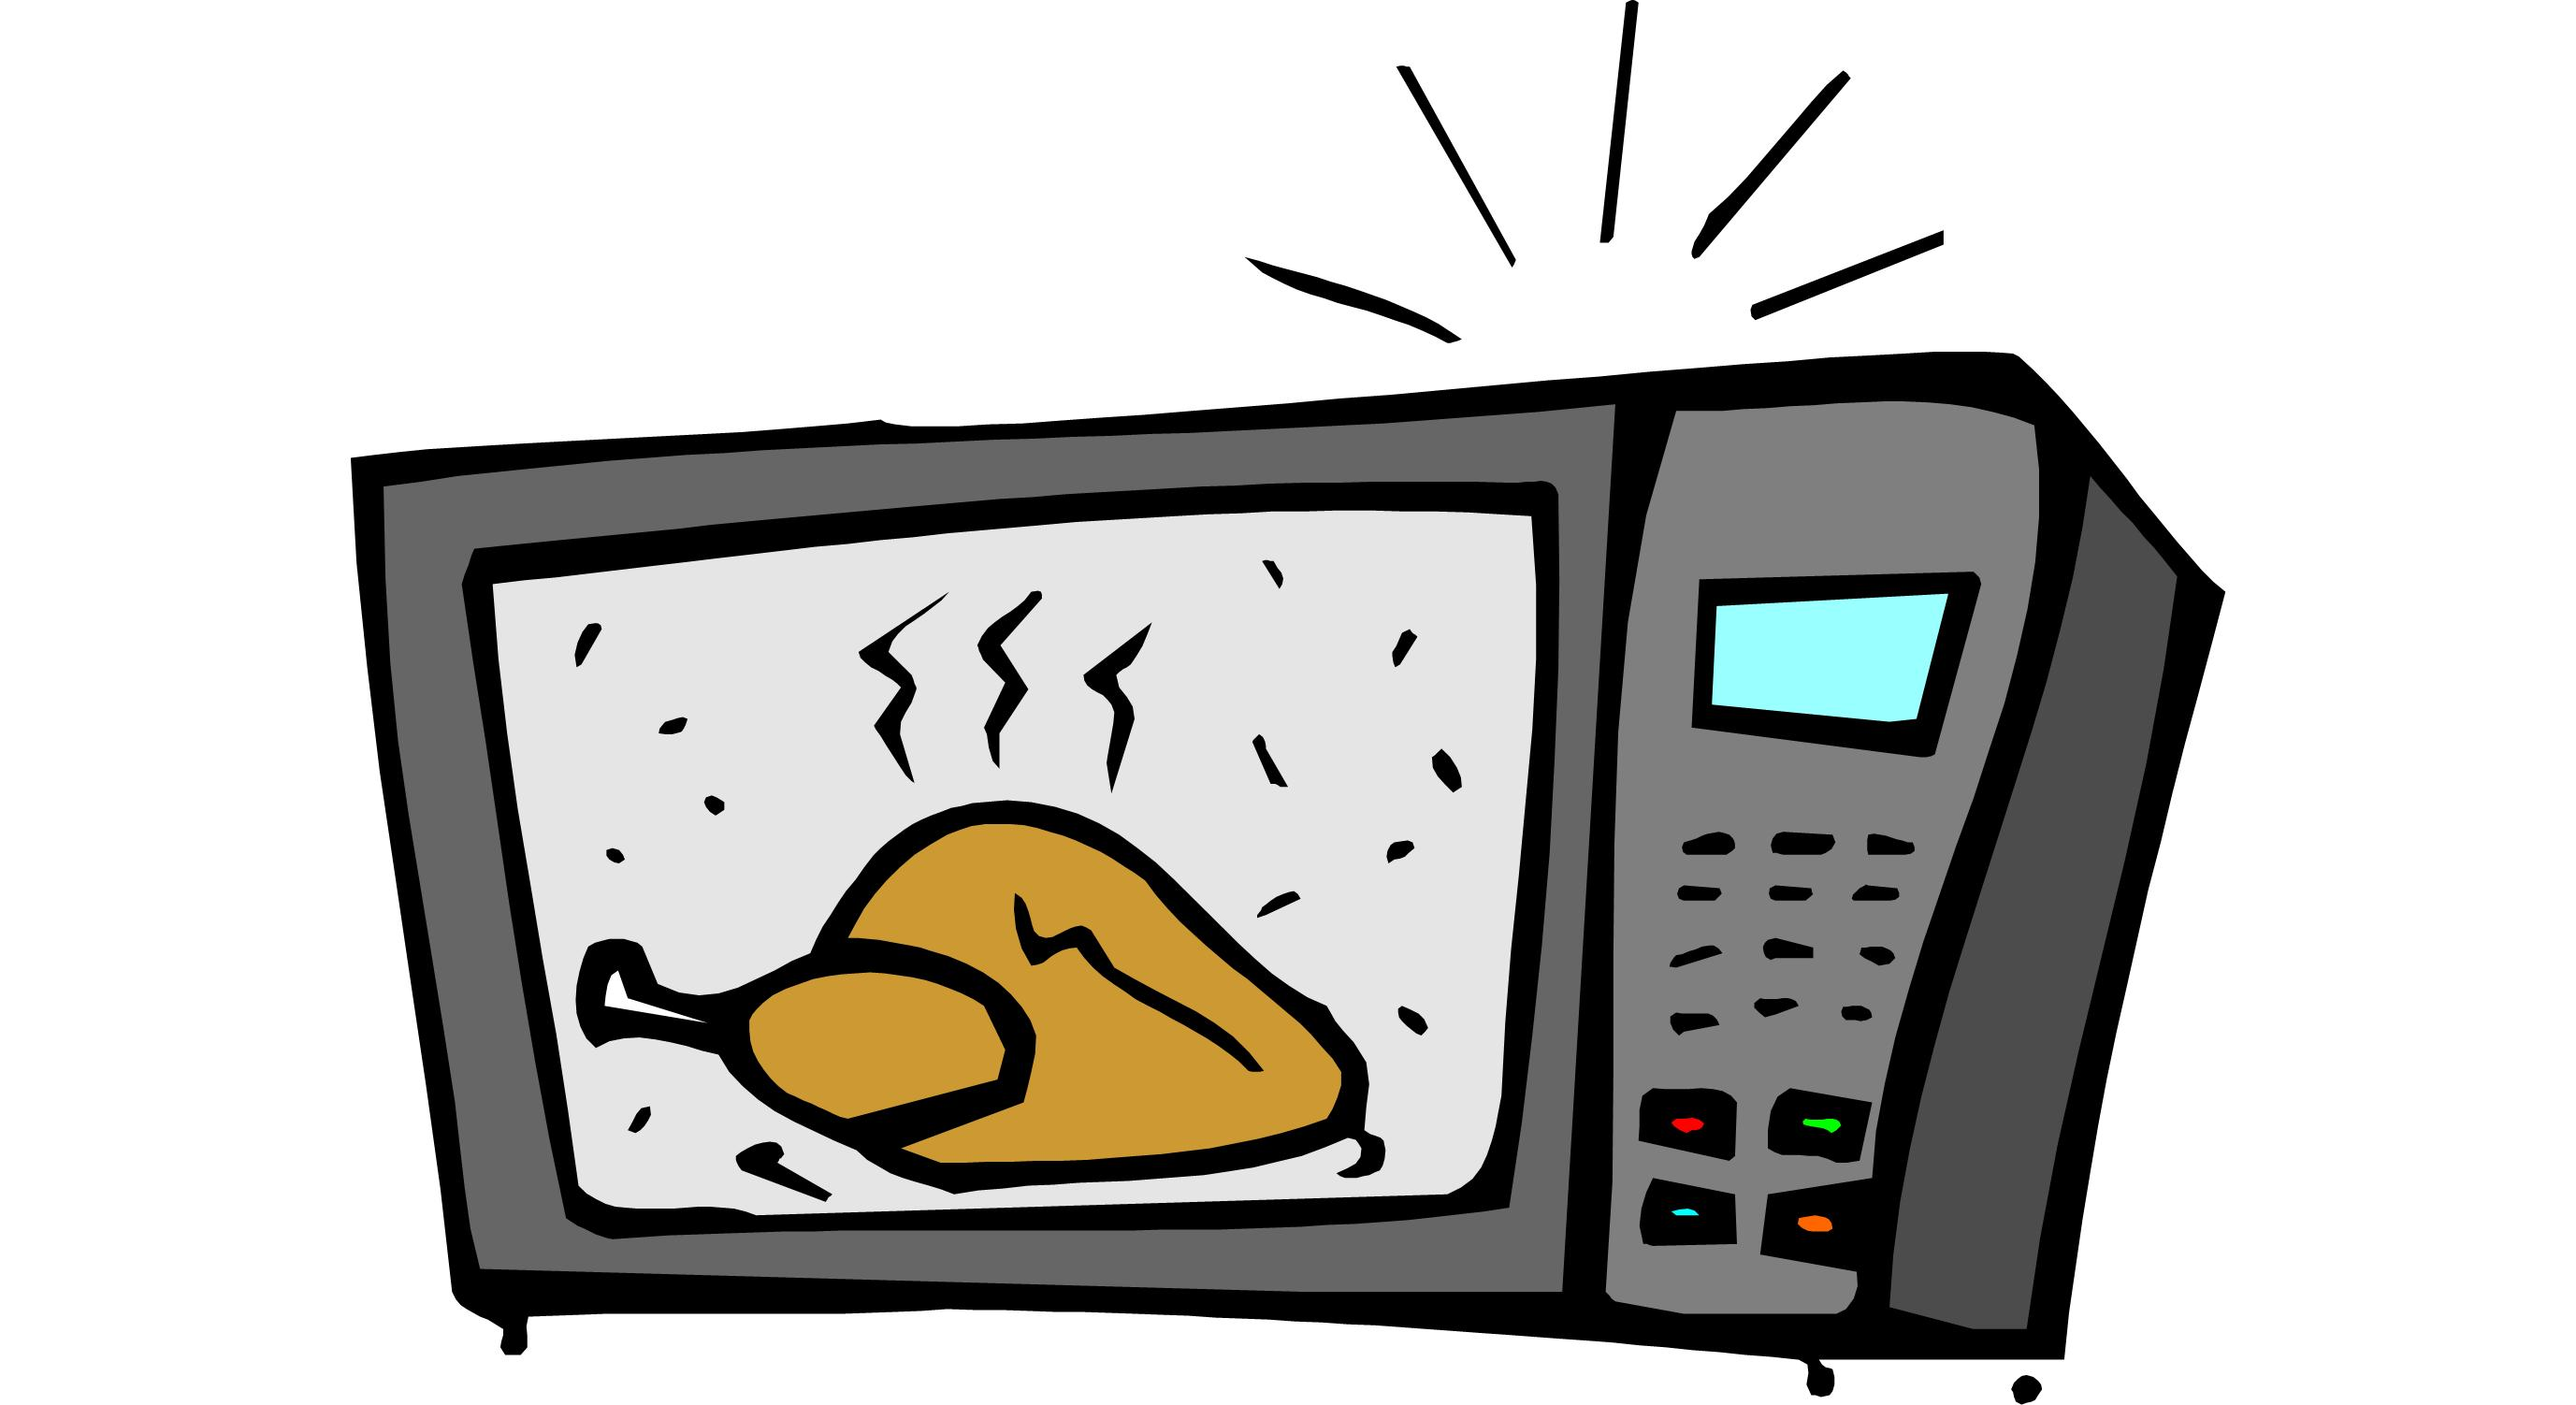 the microwave ovens effect doowans news events. Black Bedroom Furniture Sets. Home Design Ideas